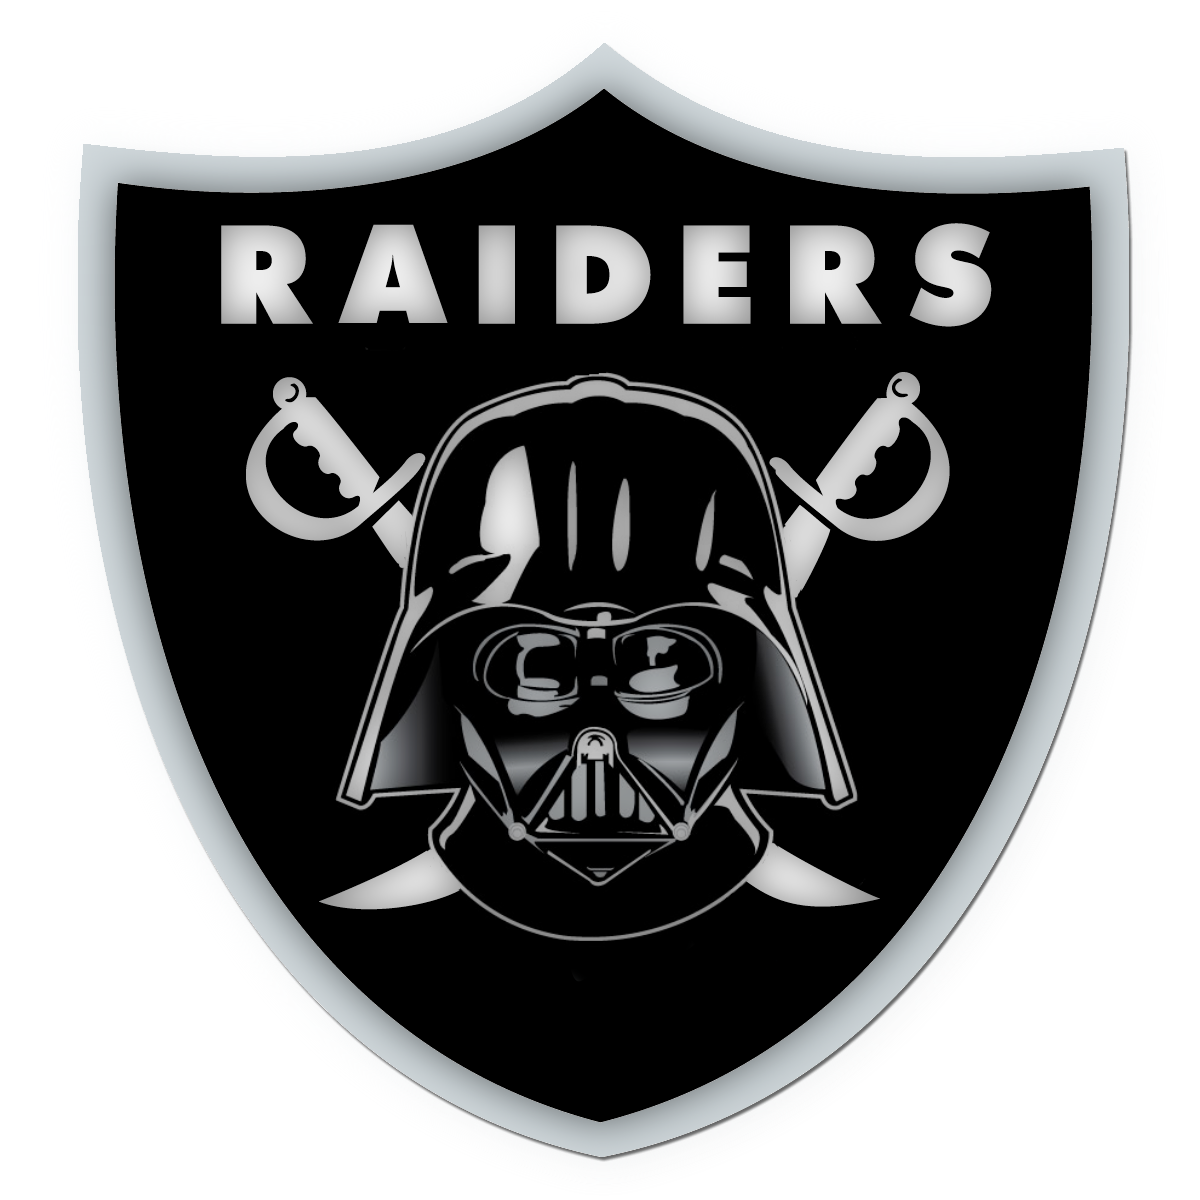 Oakland Raiders Logo Oakland Raiders Logo Oakland Raiders Oakland Raiders Football